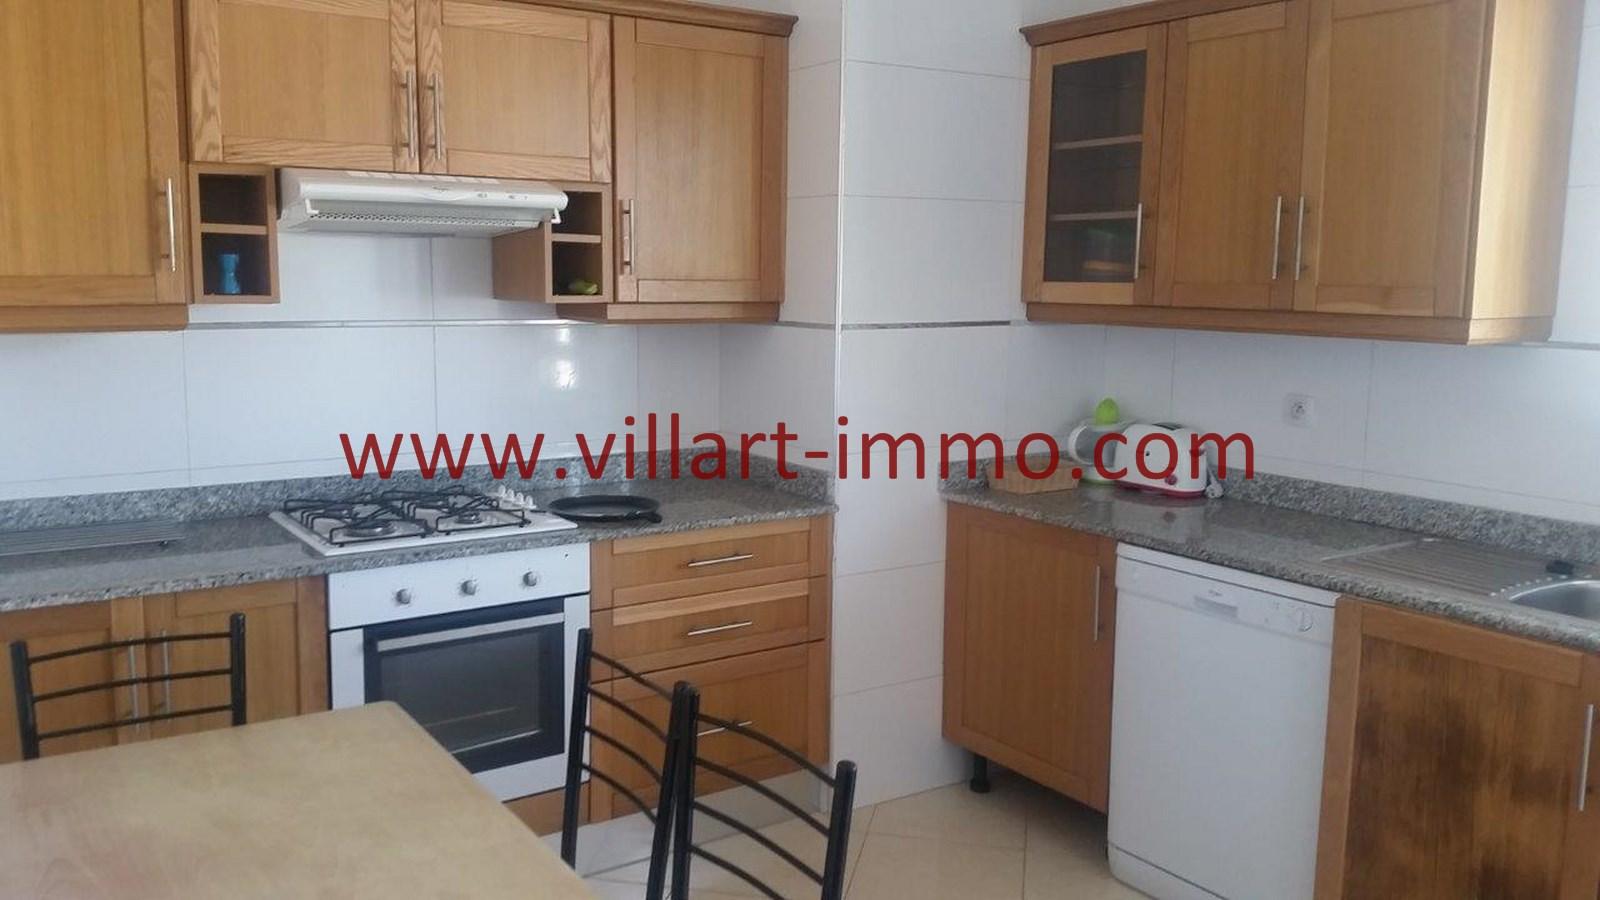 4-A vendre-Appartement-Tanger-Cuisine-VA613-Villart immo